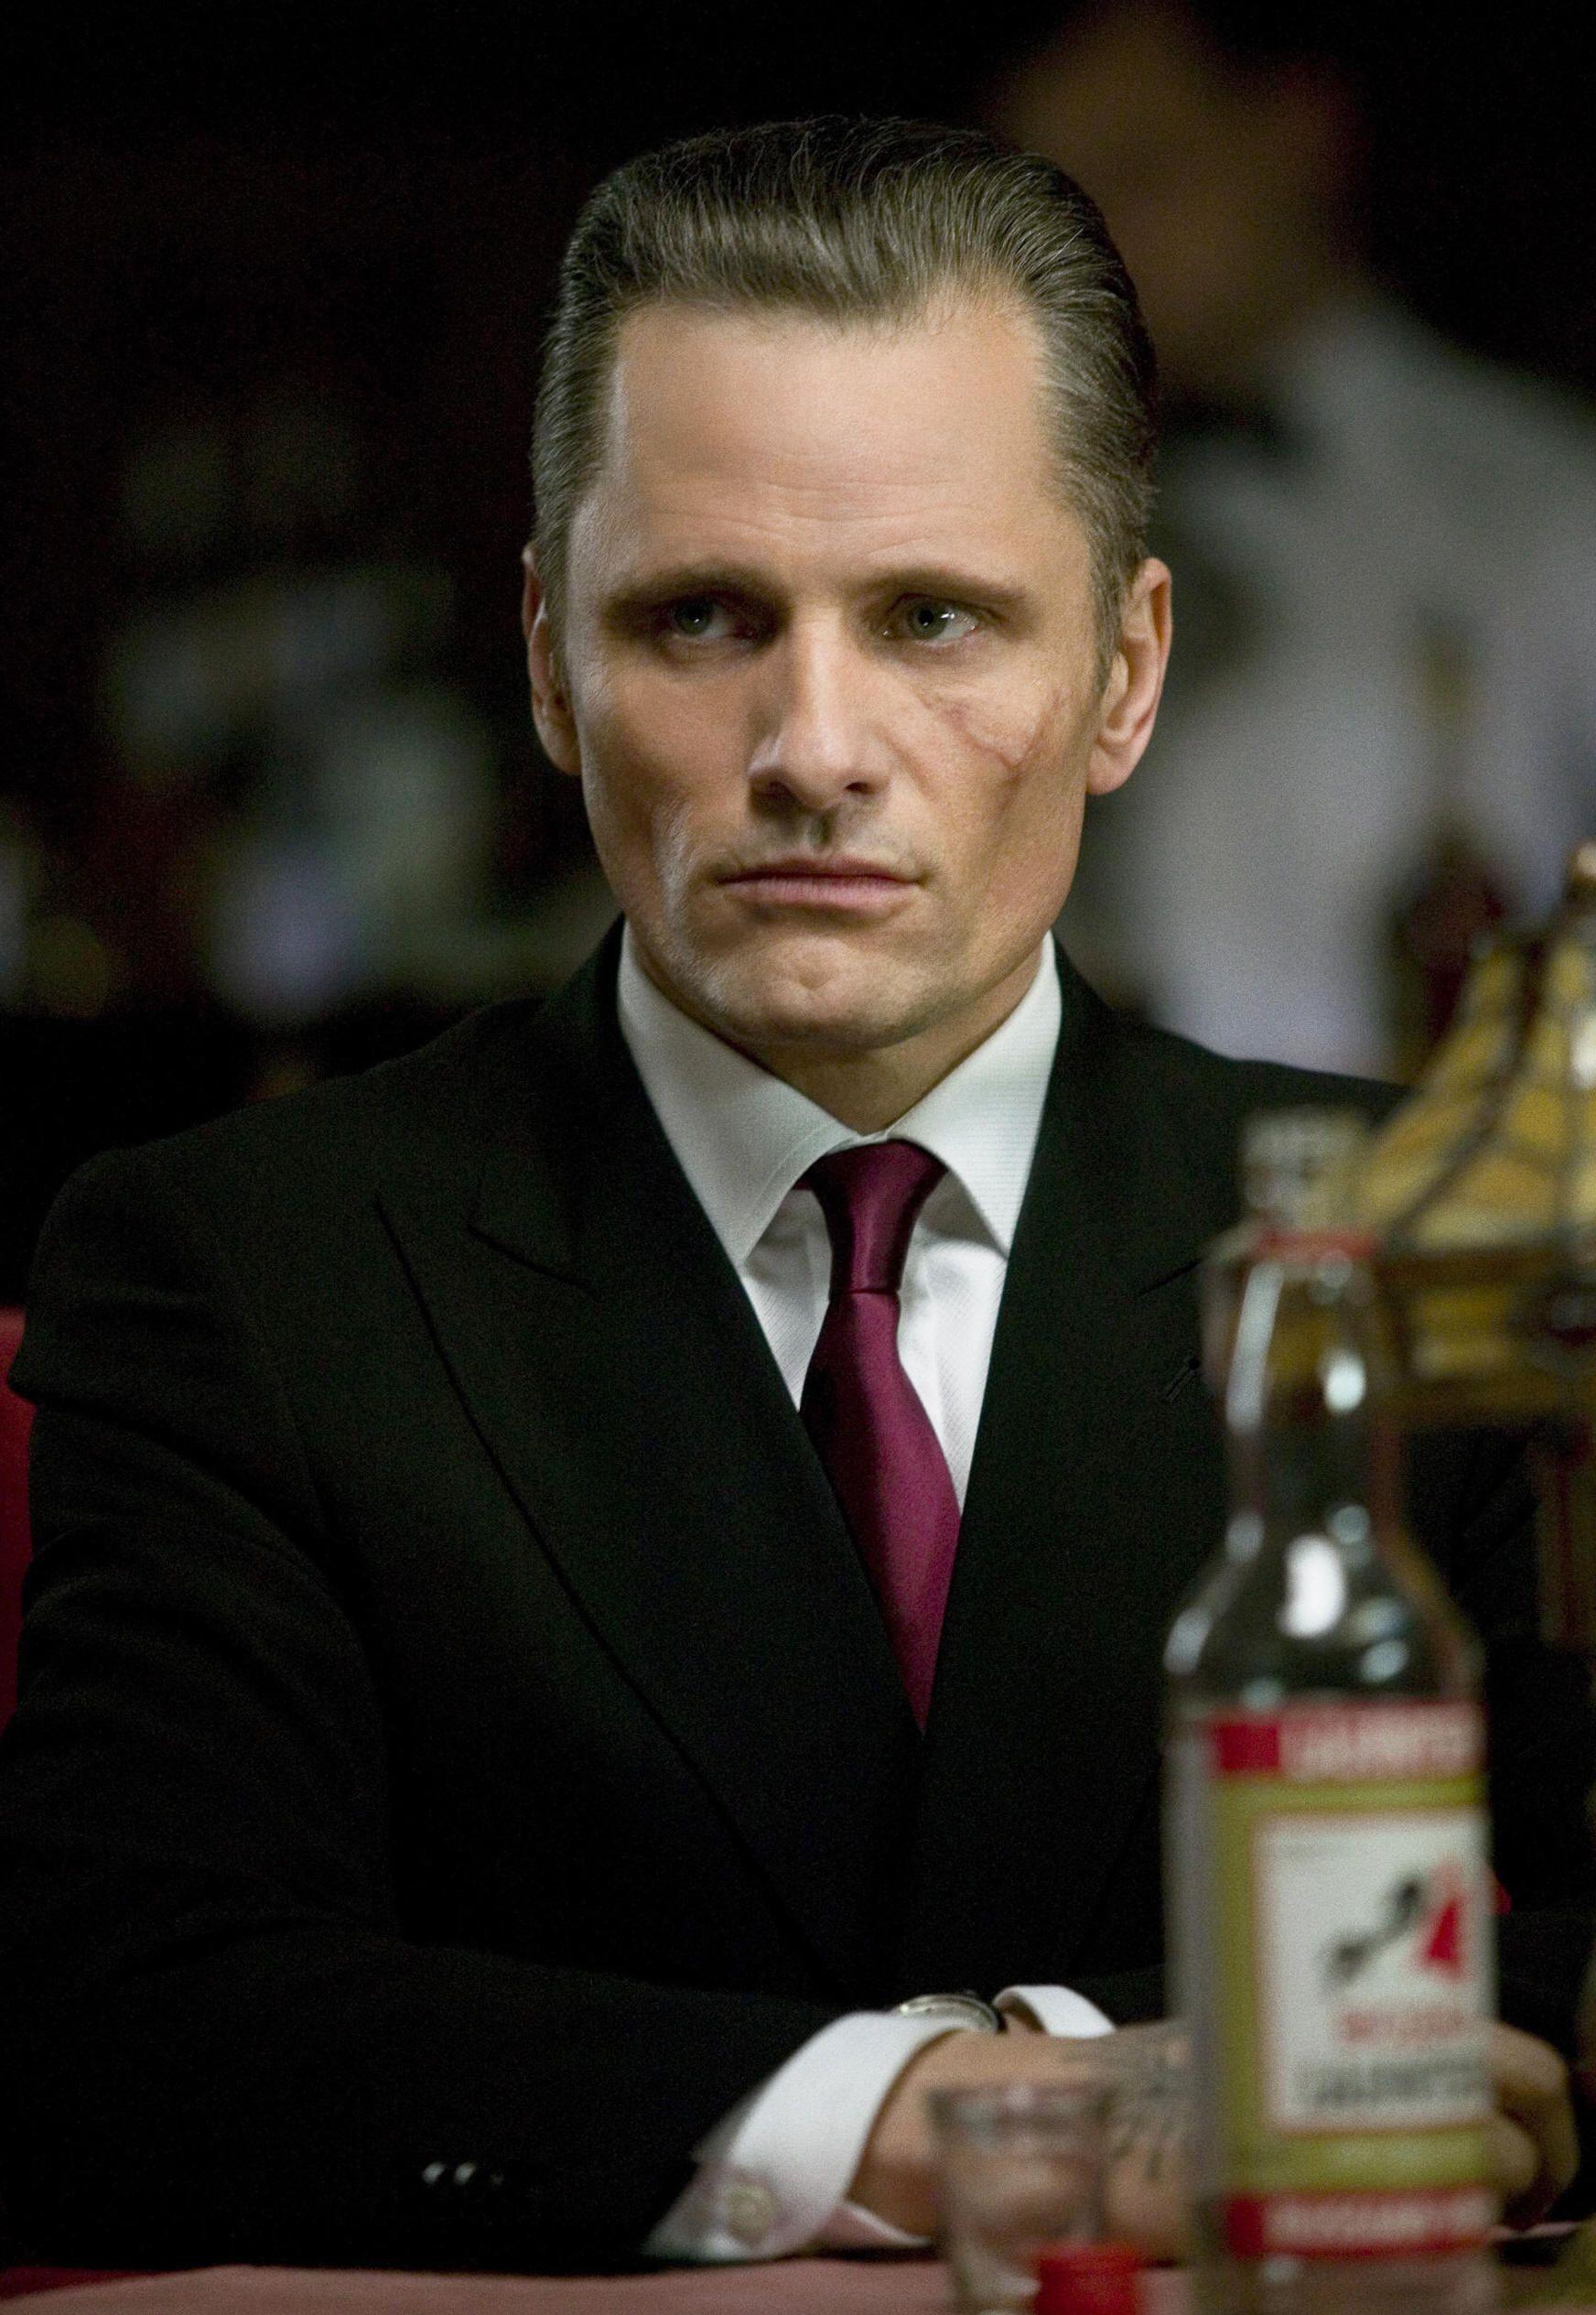 Viggo Mortensen as Nikolai in Eastern Promisses Set